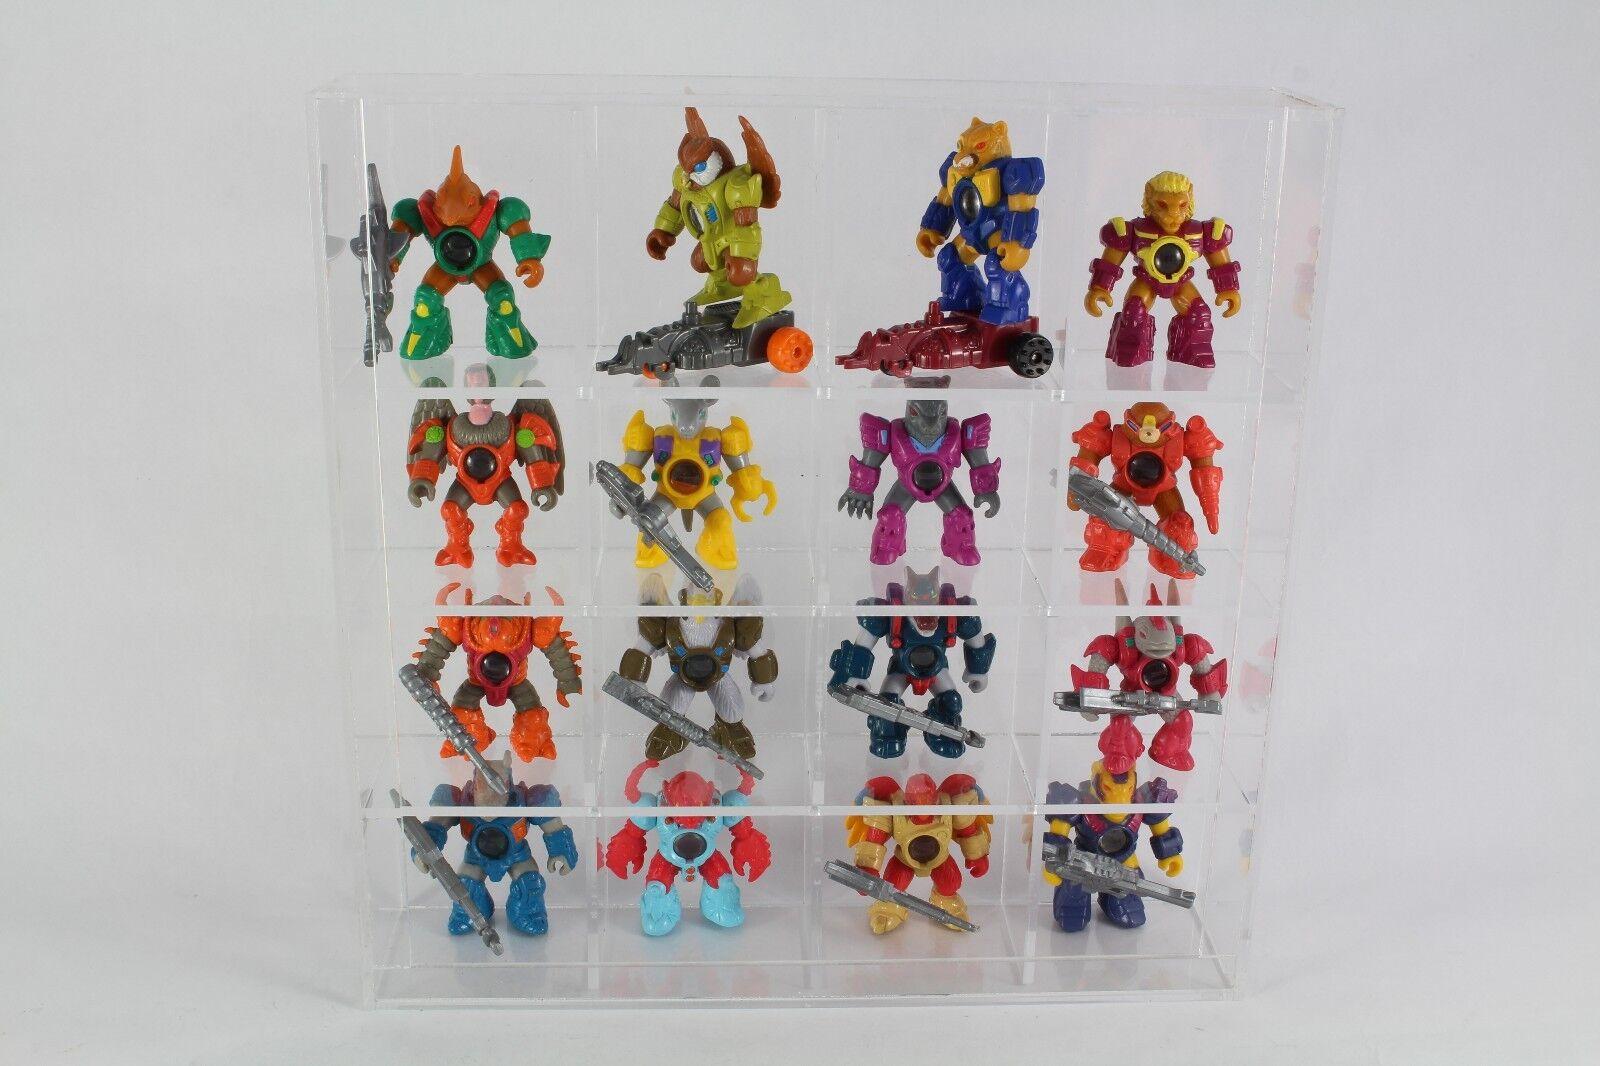 Acrylic Acrylic Acrylic Display Case For Battle Beasts Lego etc (Holds 16) Figures Not Included d72e9b